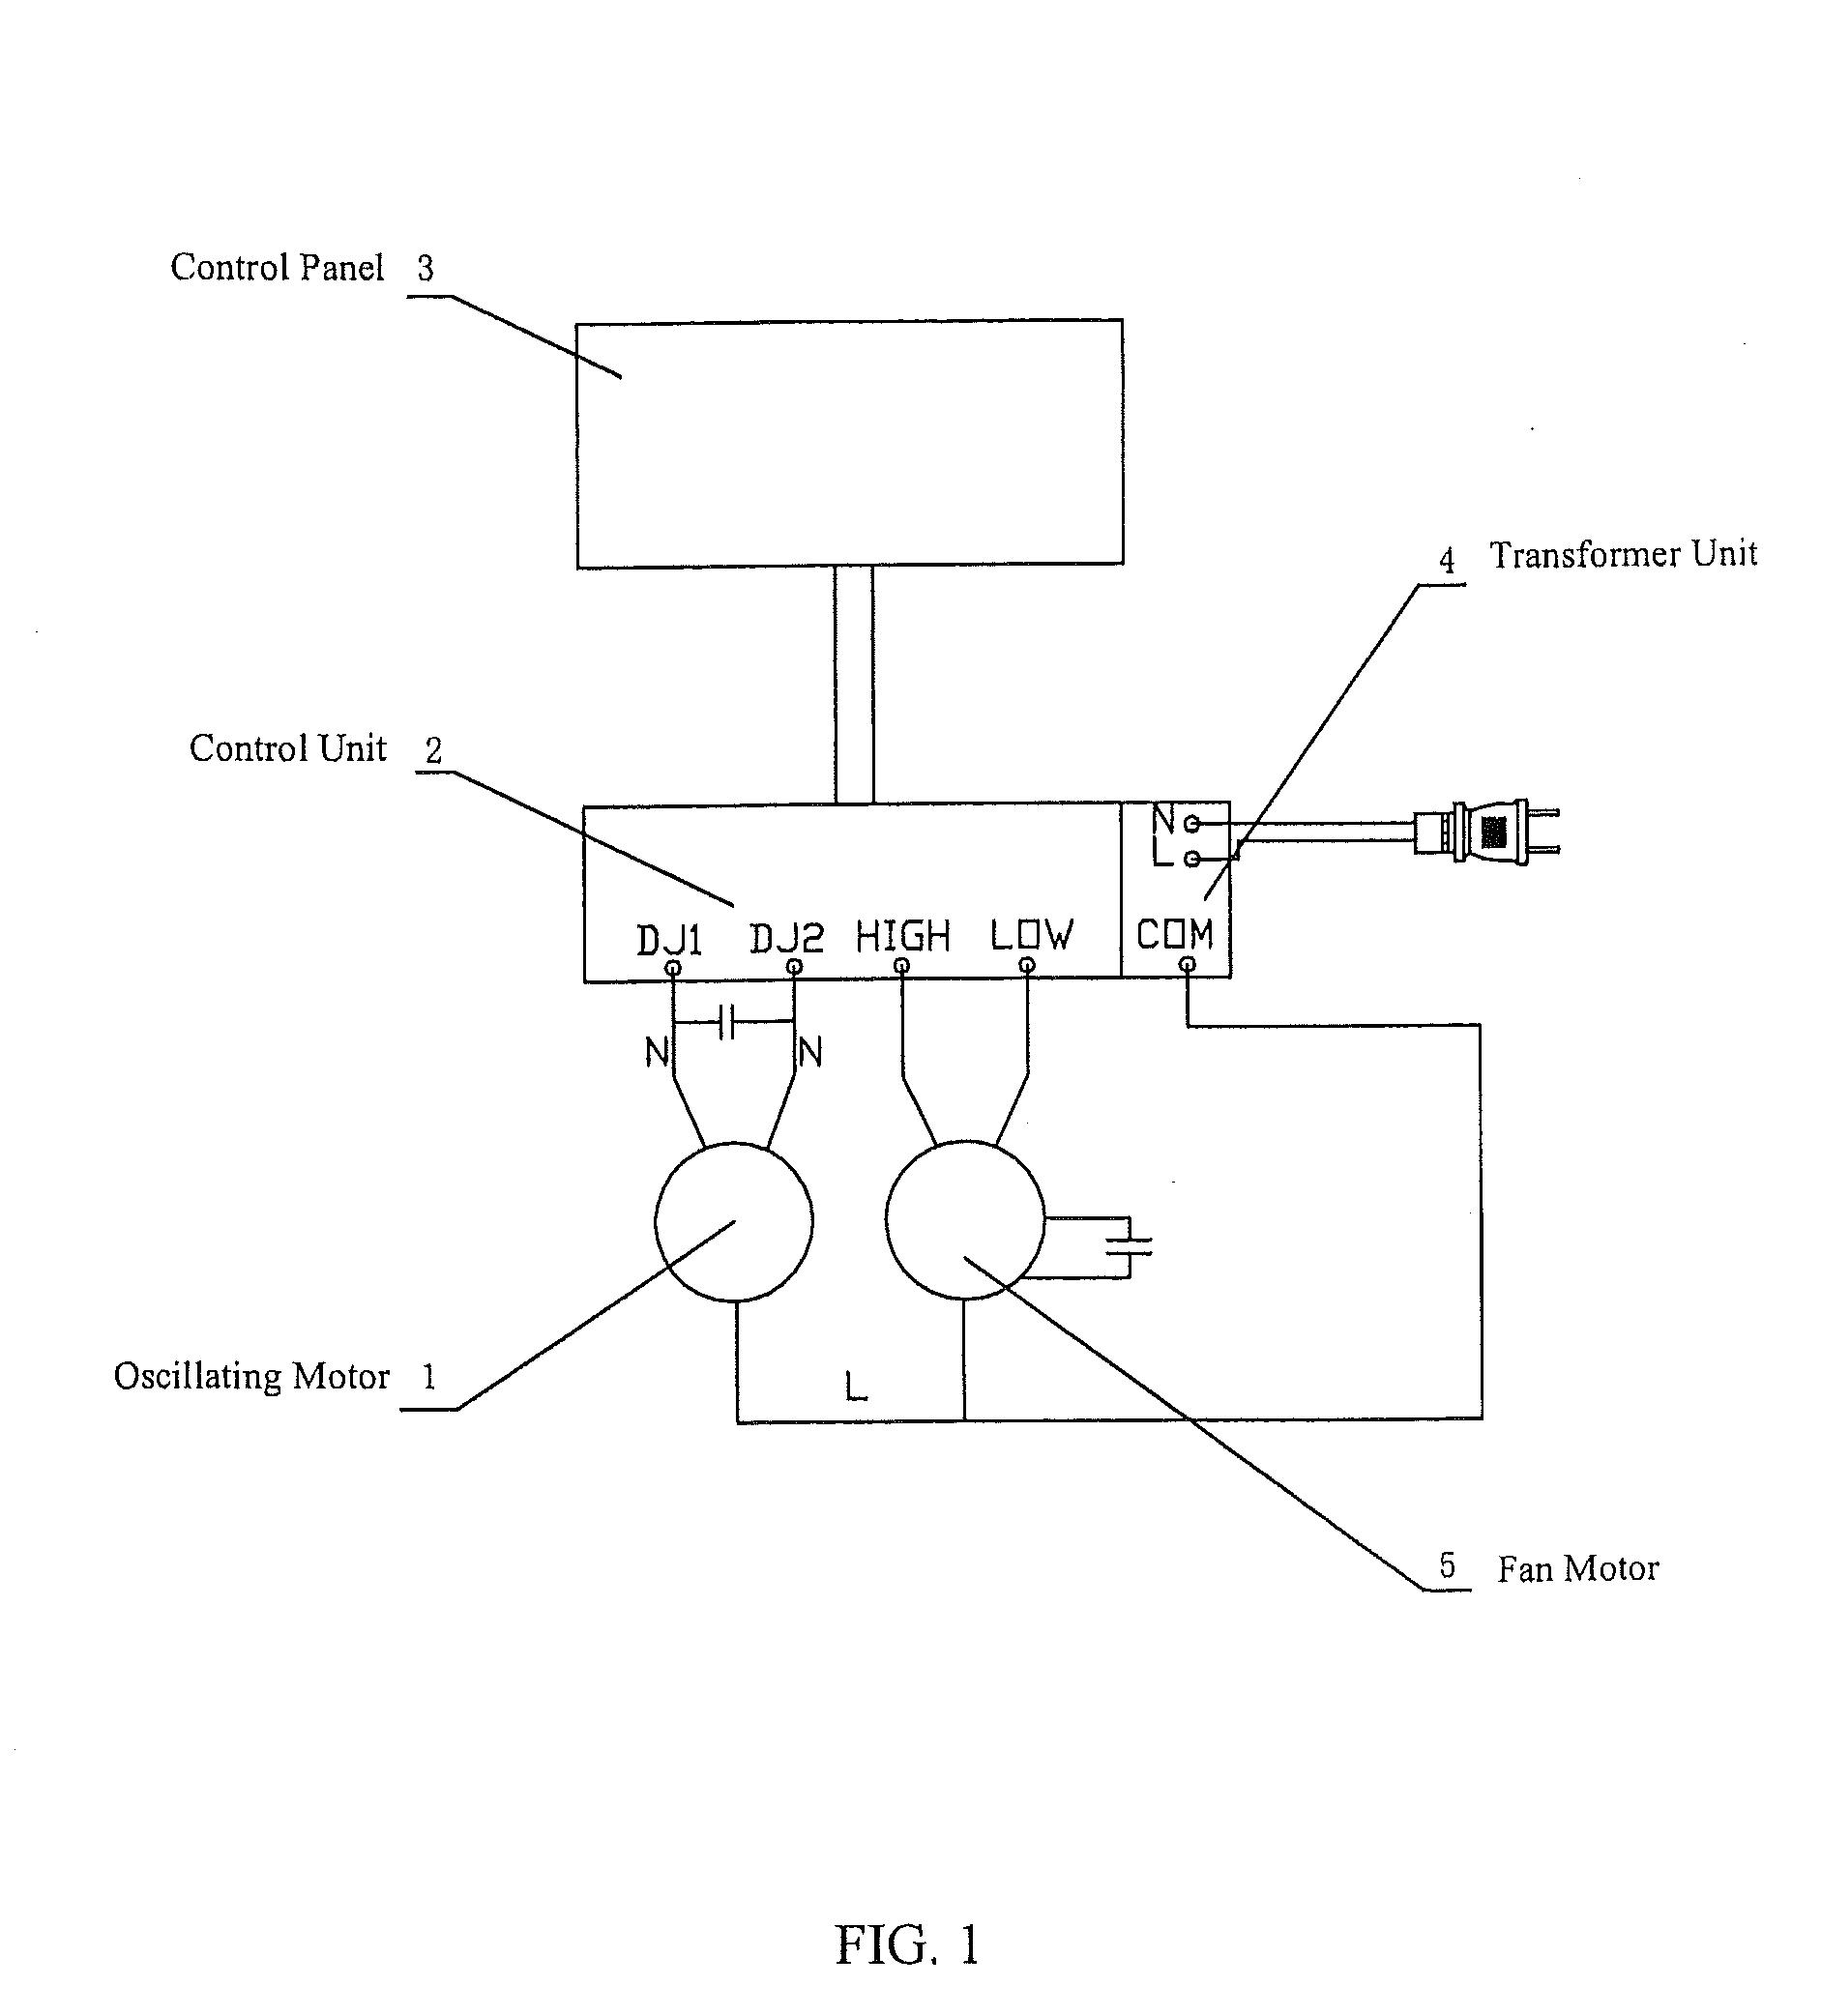 [QNCB_7524]  OT_8484] Lasko Fan Wiring Diagram Free Diagram | Oscillating Tower Fan Motor Wiring Diagram |  | Itis Stre Over Marki Xolia Mohammedshrine Librar Wiring 101